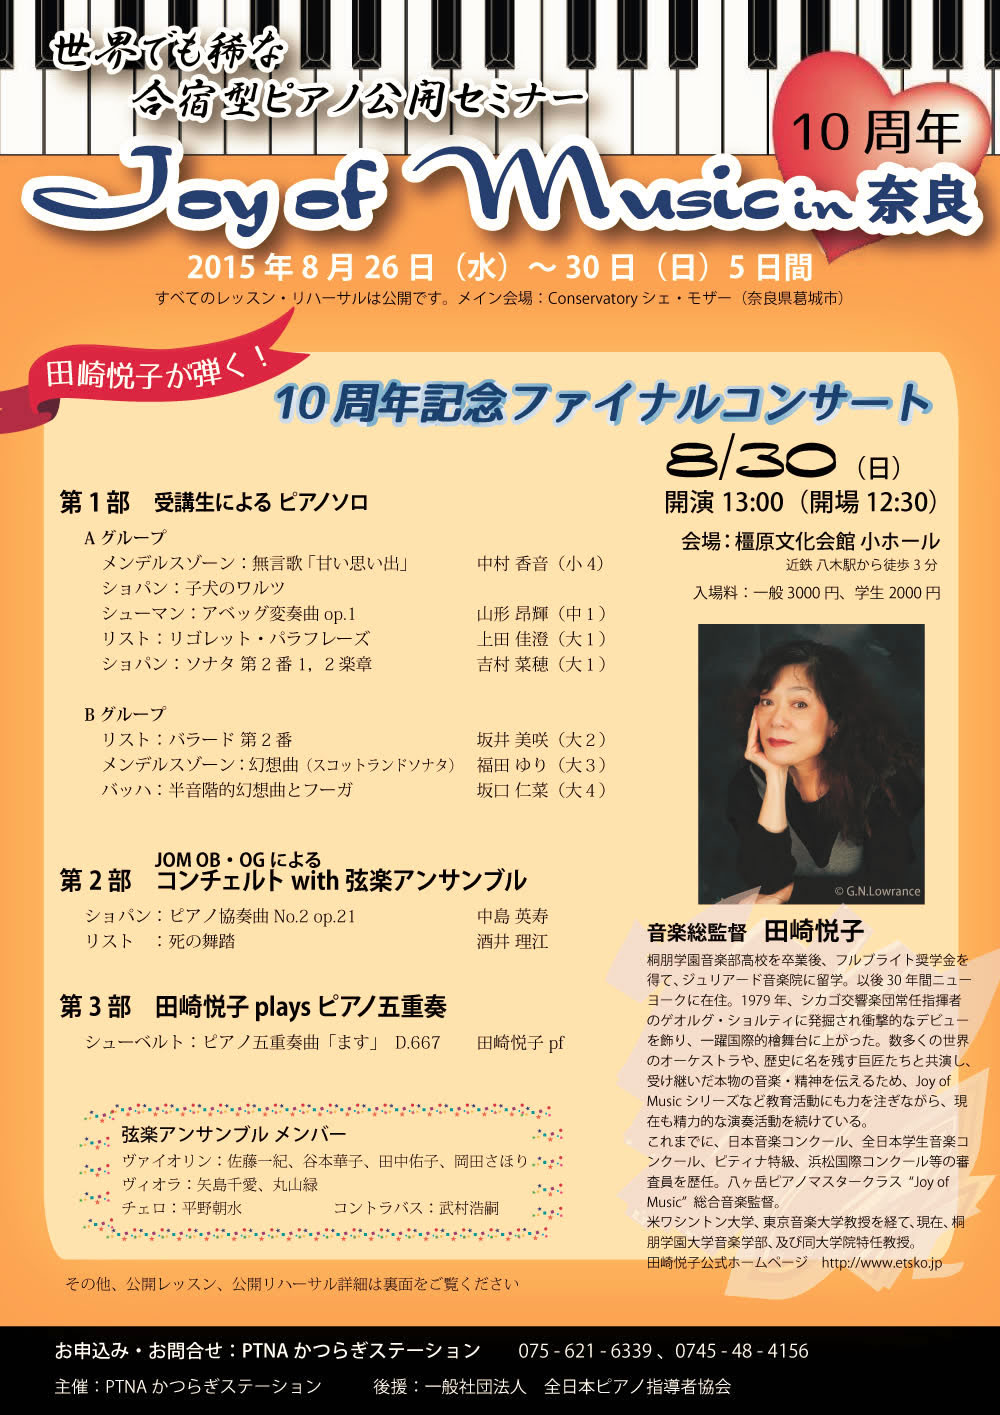 http://www.piano.or.jp/report/images/150819_JOM.jpg